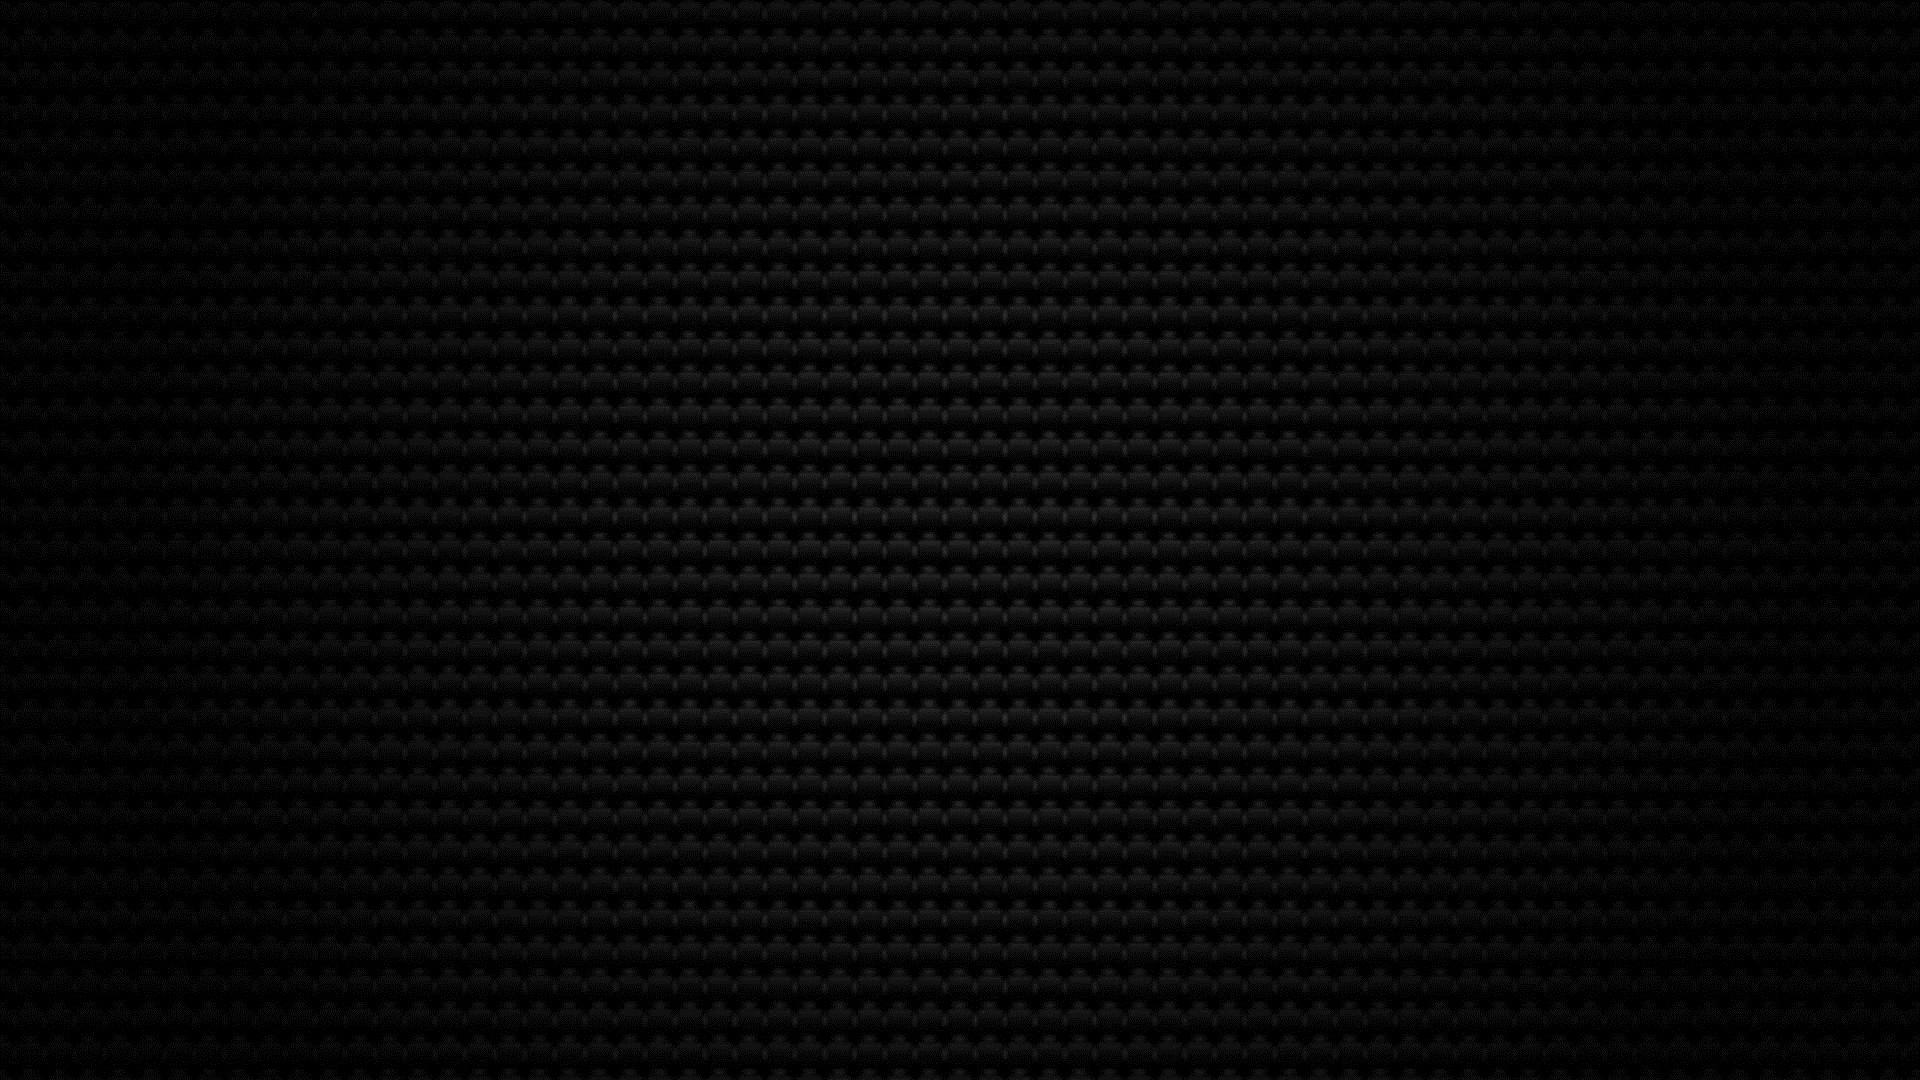 Carbon Fiber full wallpaper